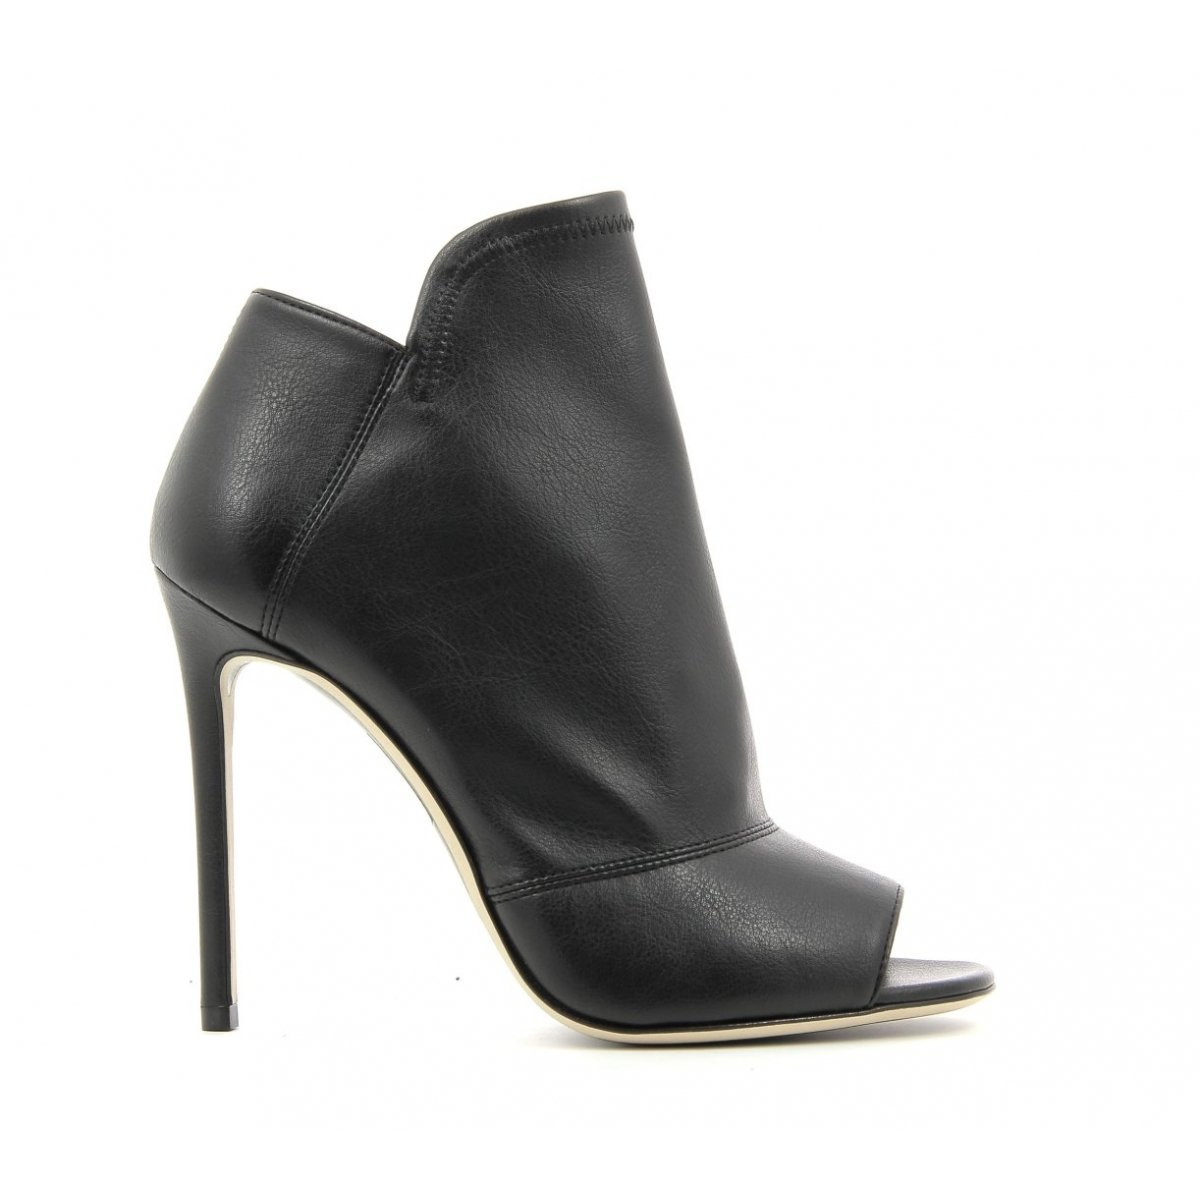 Bottines open-toe à talons noirs  - GreyMer